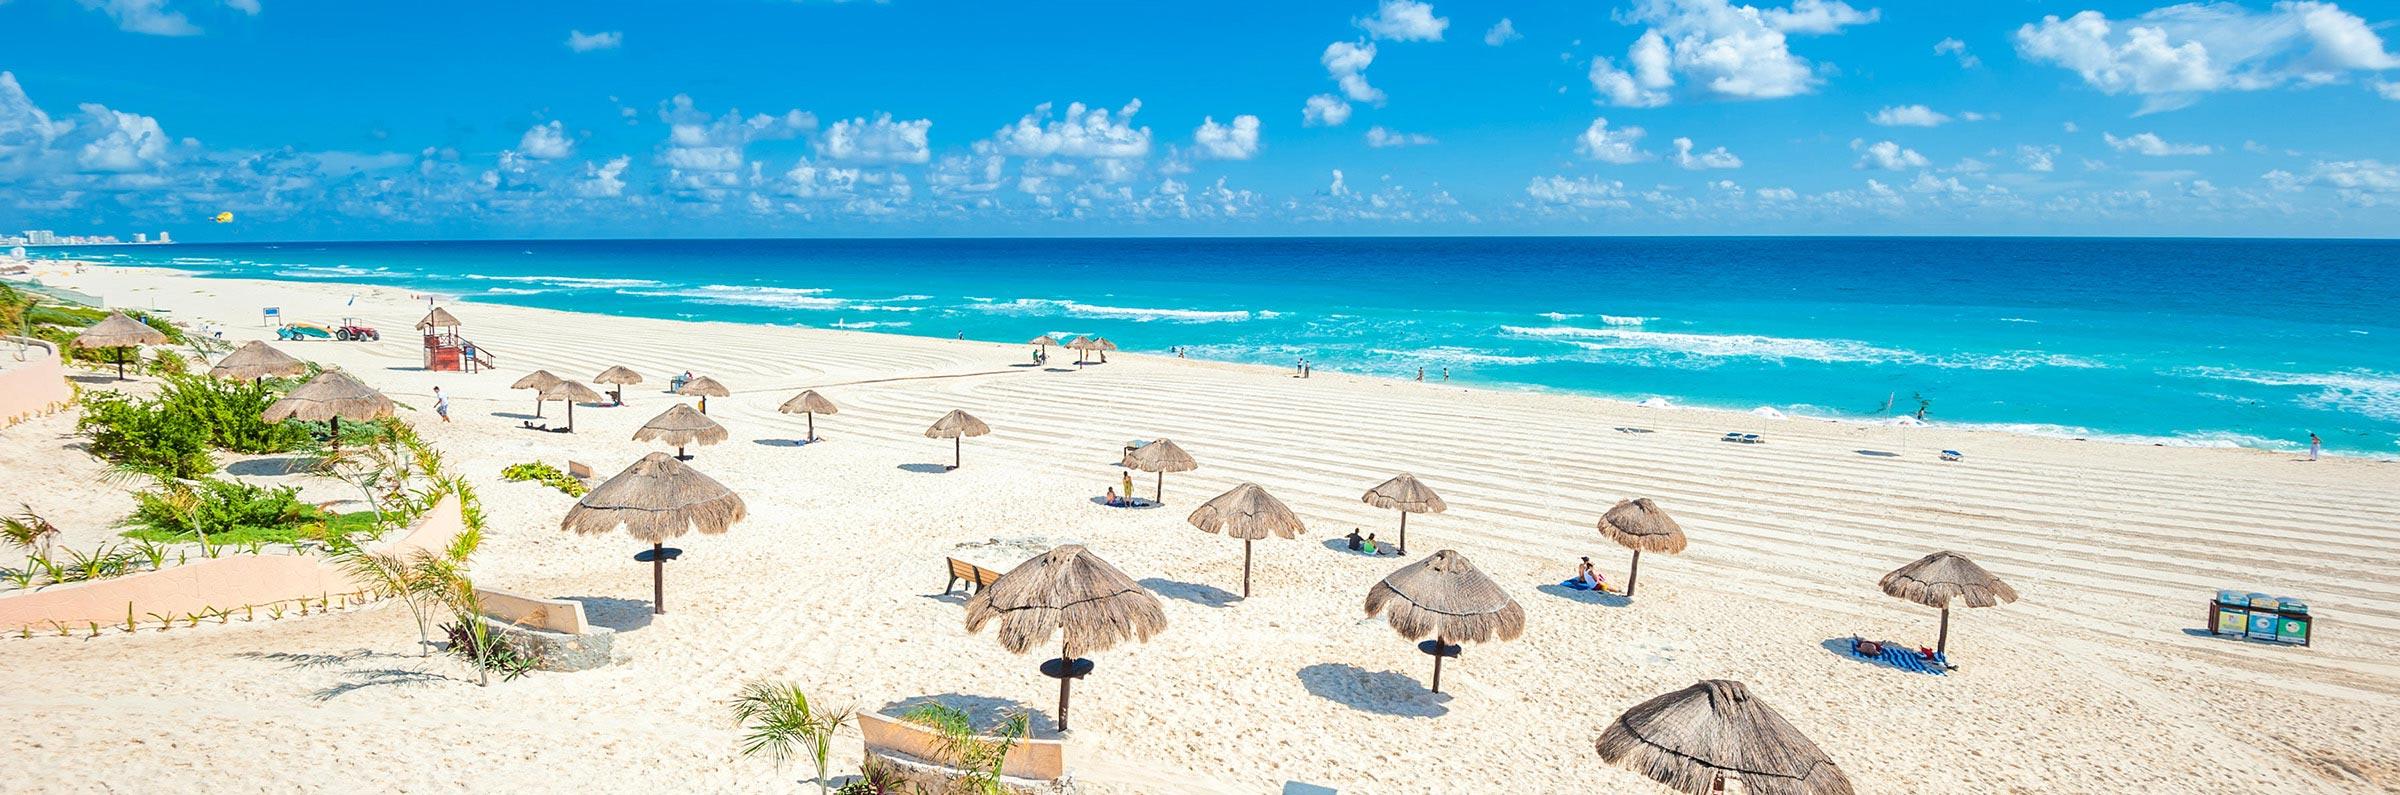 Luoghi e attrazioni in Cancun